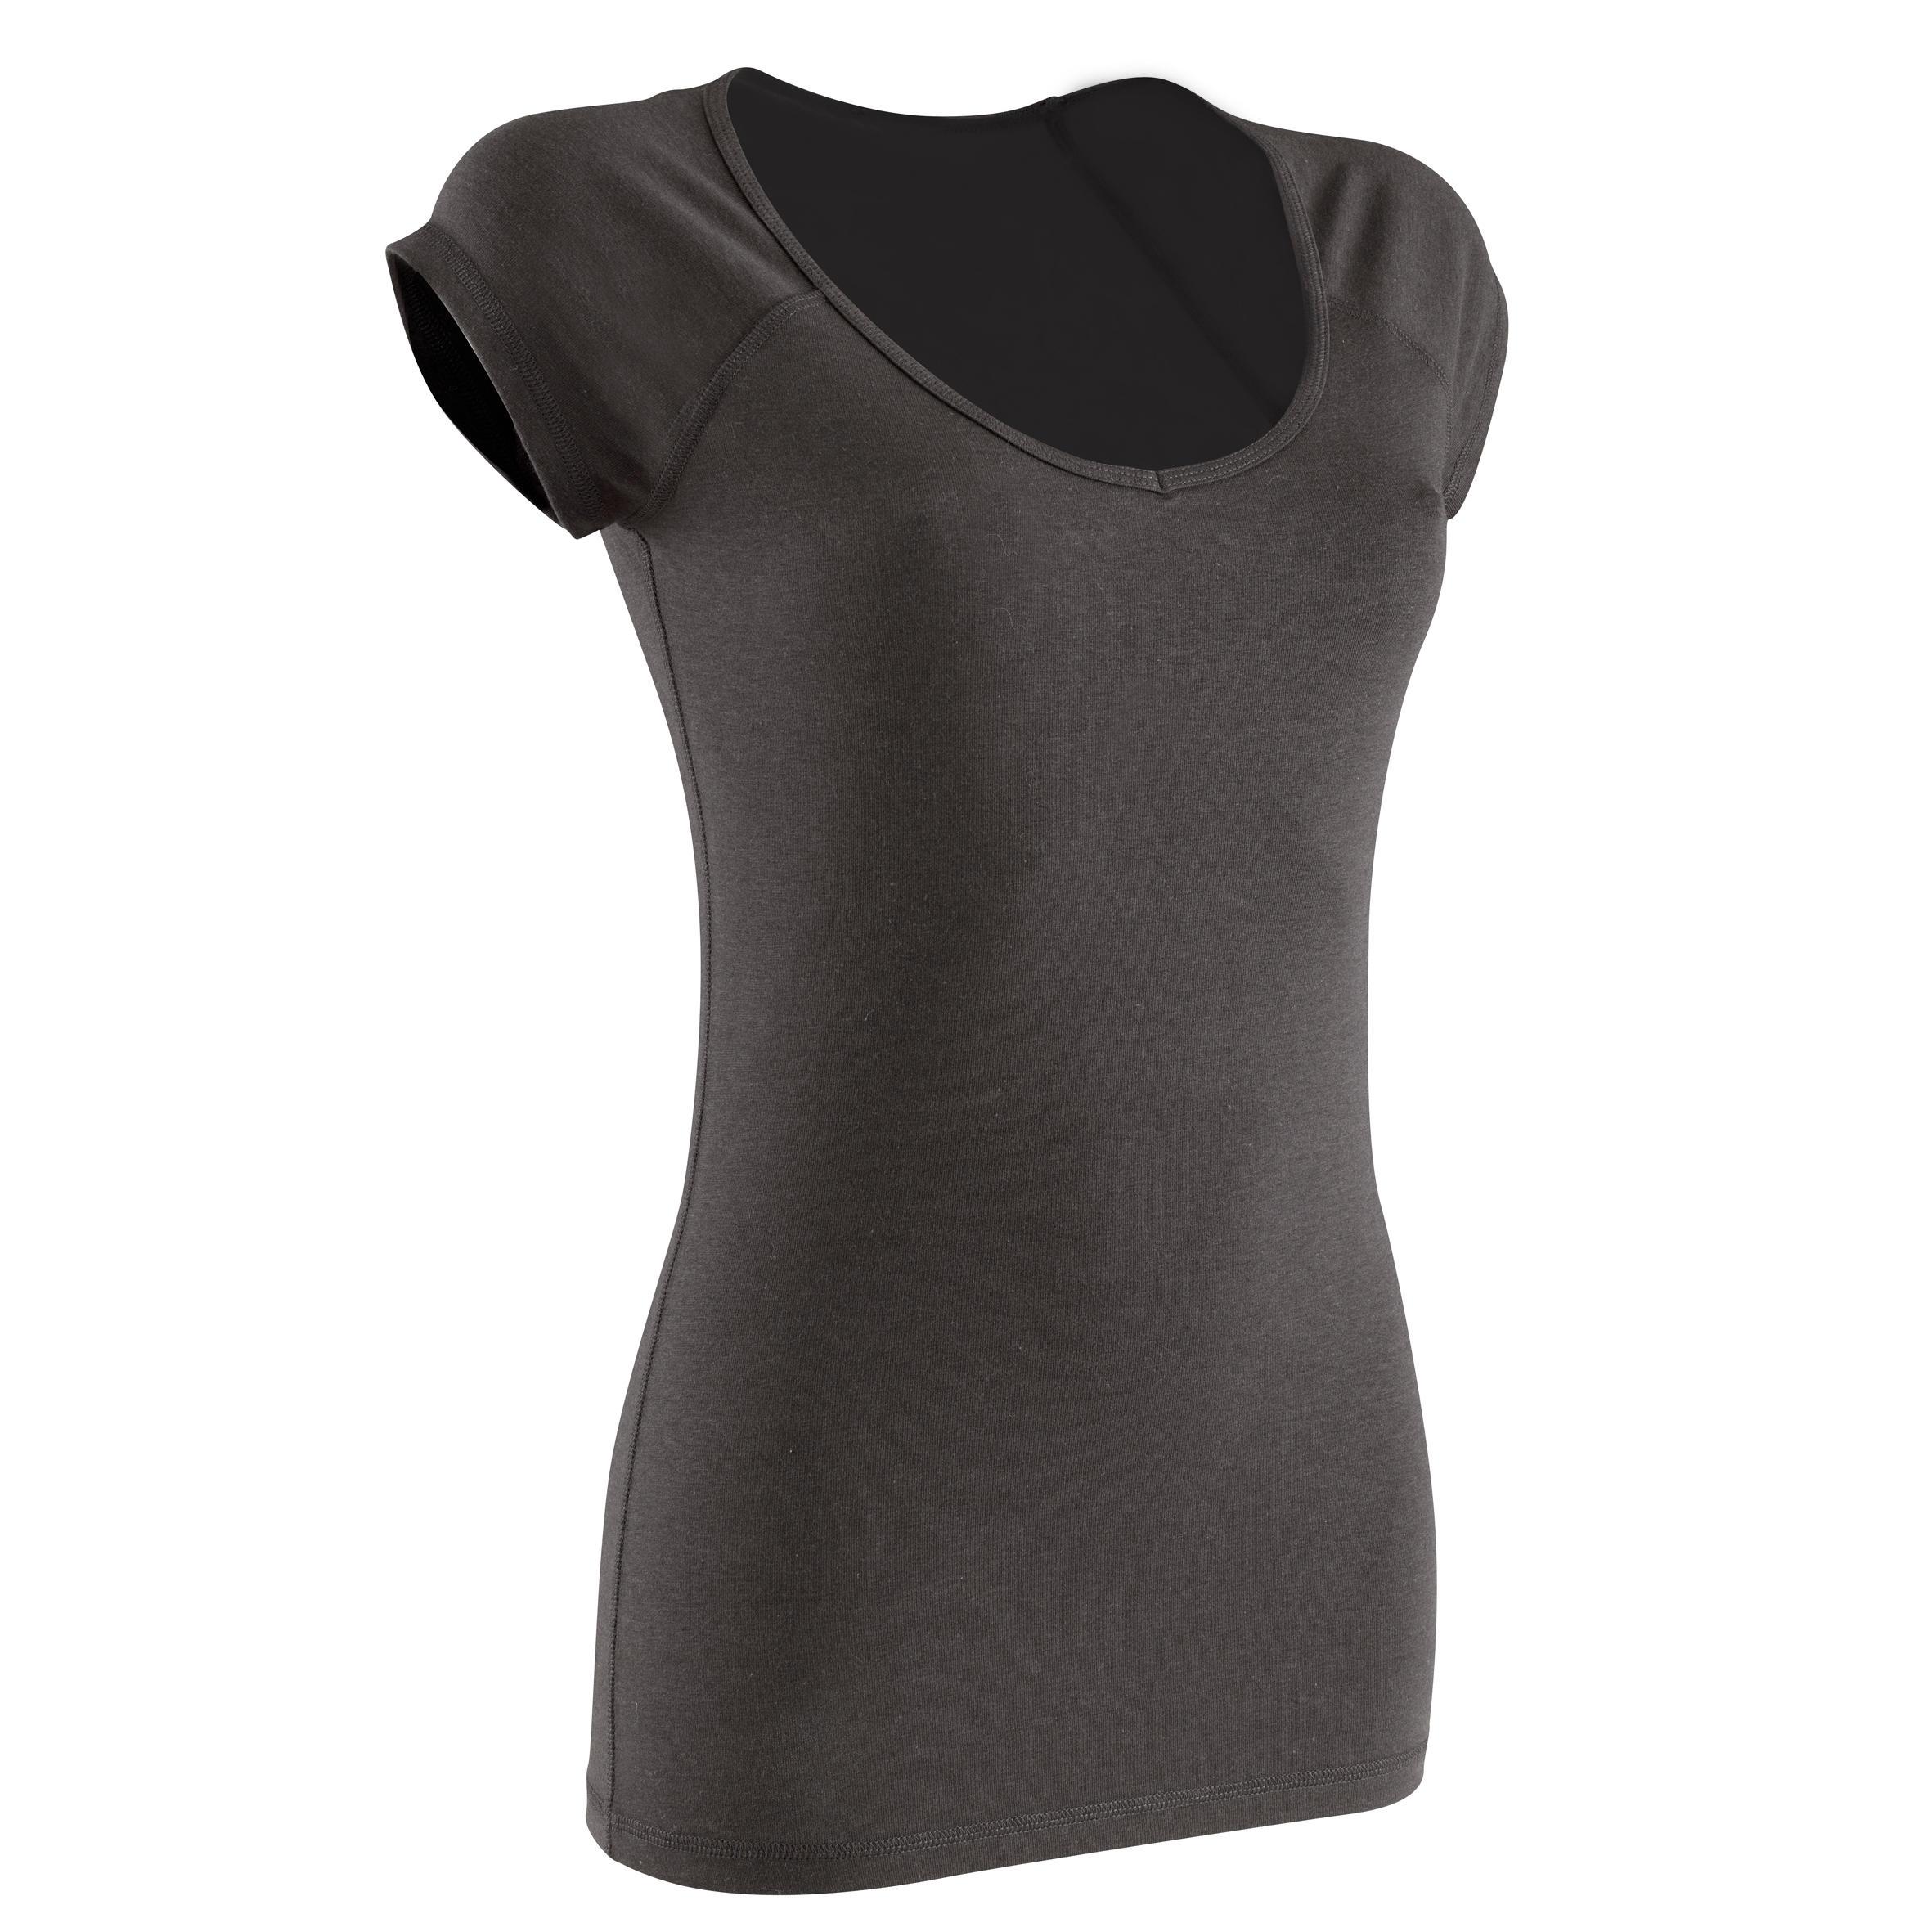 Active Women's Slim-Fit Short-Sleeved Fitness T-Shirt - Black